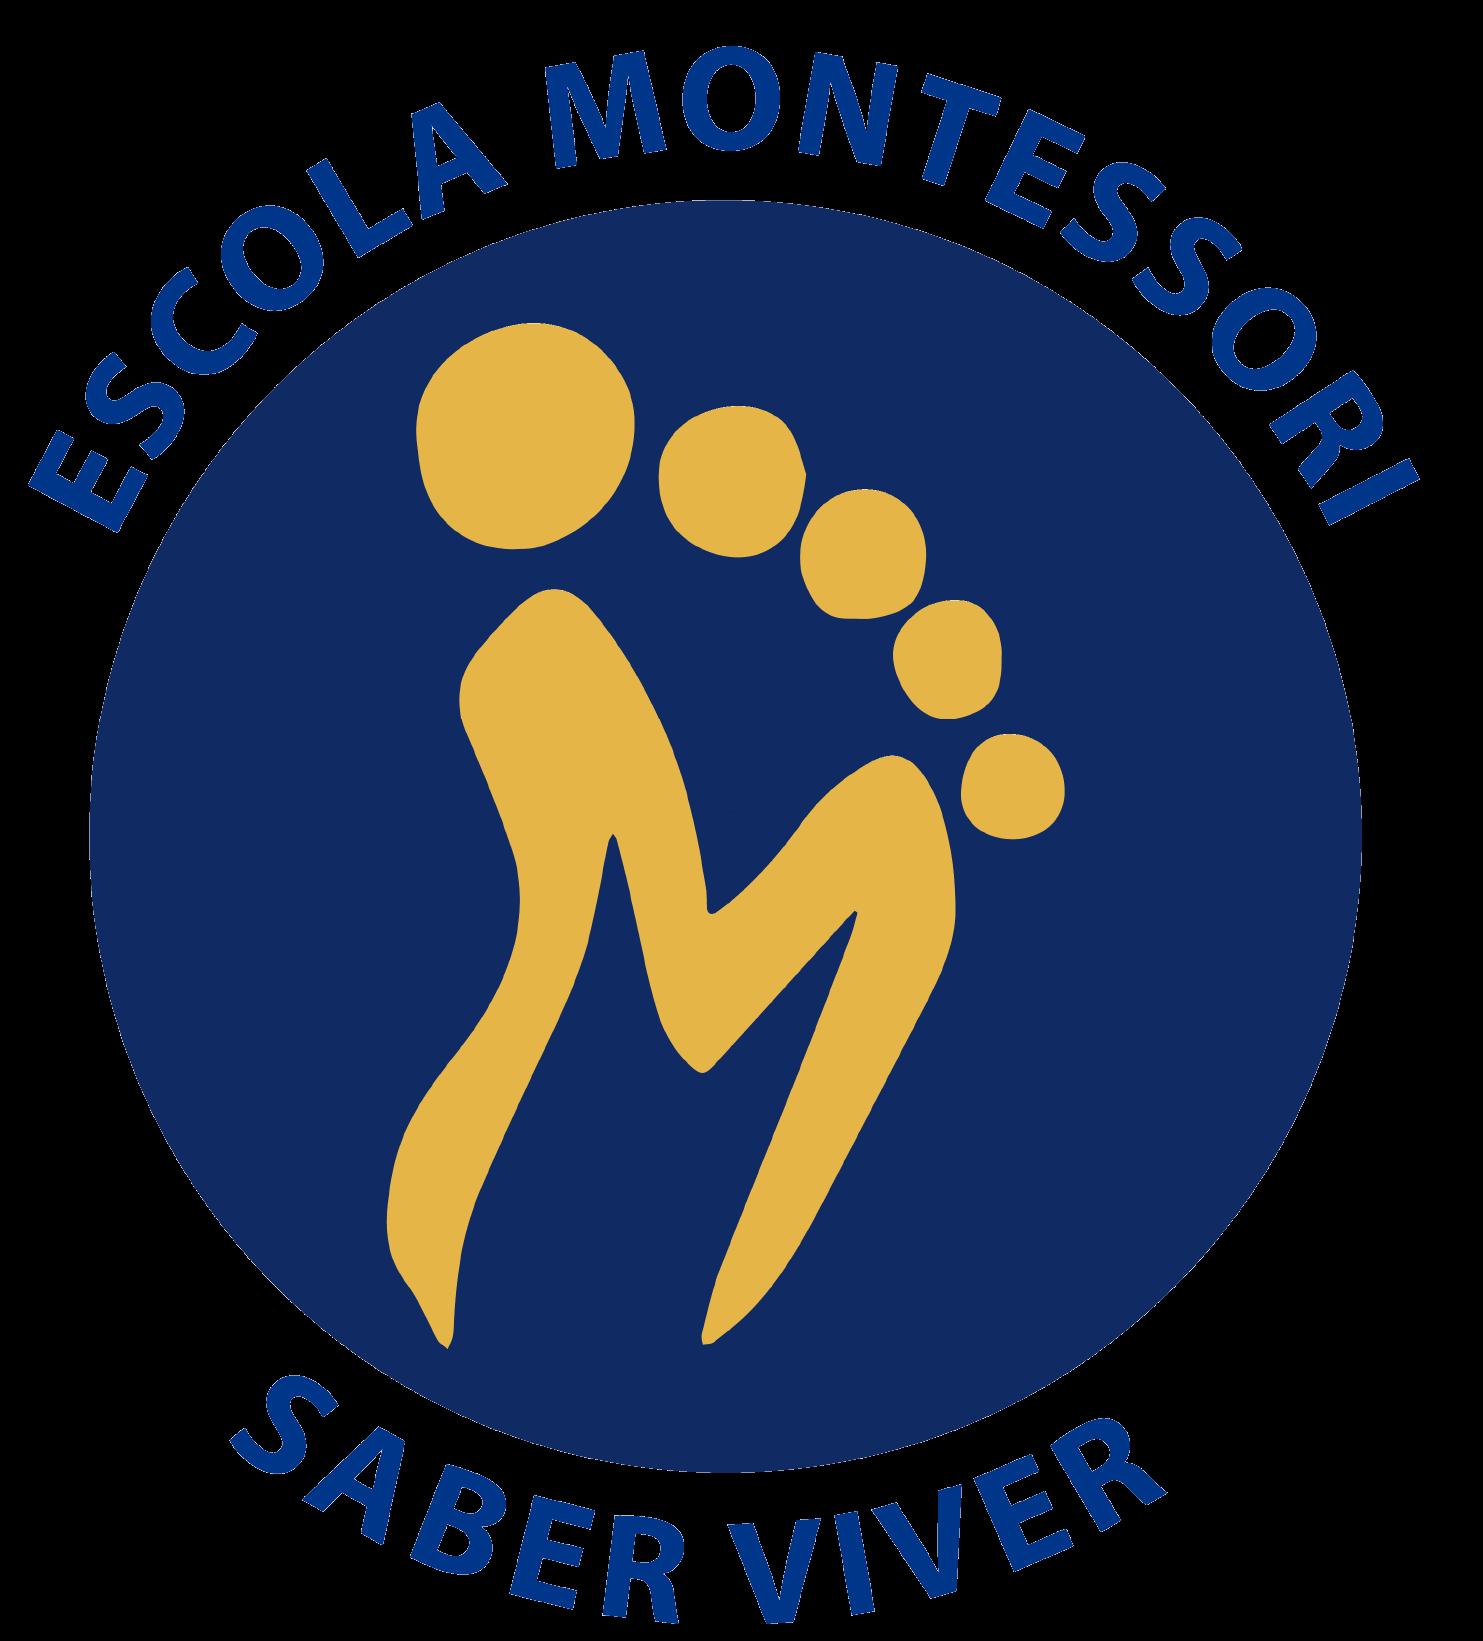 ESCOLA MONTESSORI SABER VIVER